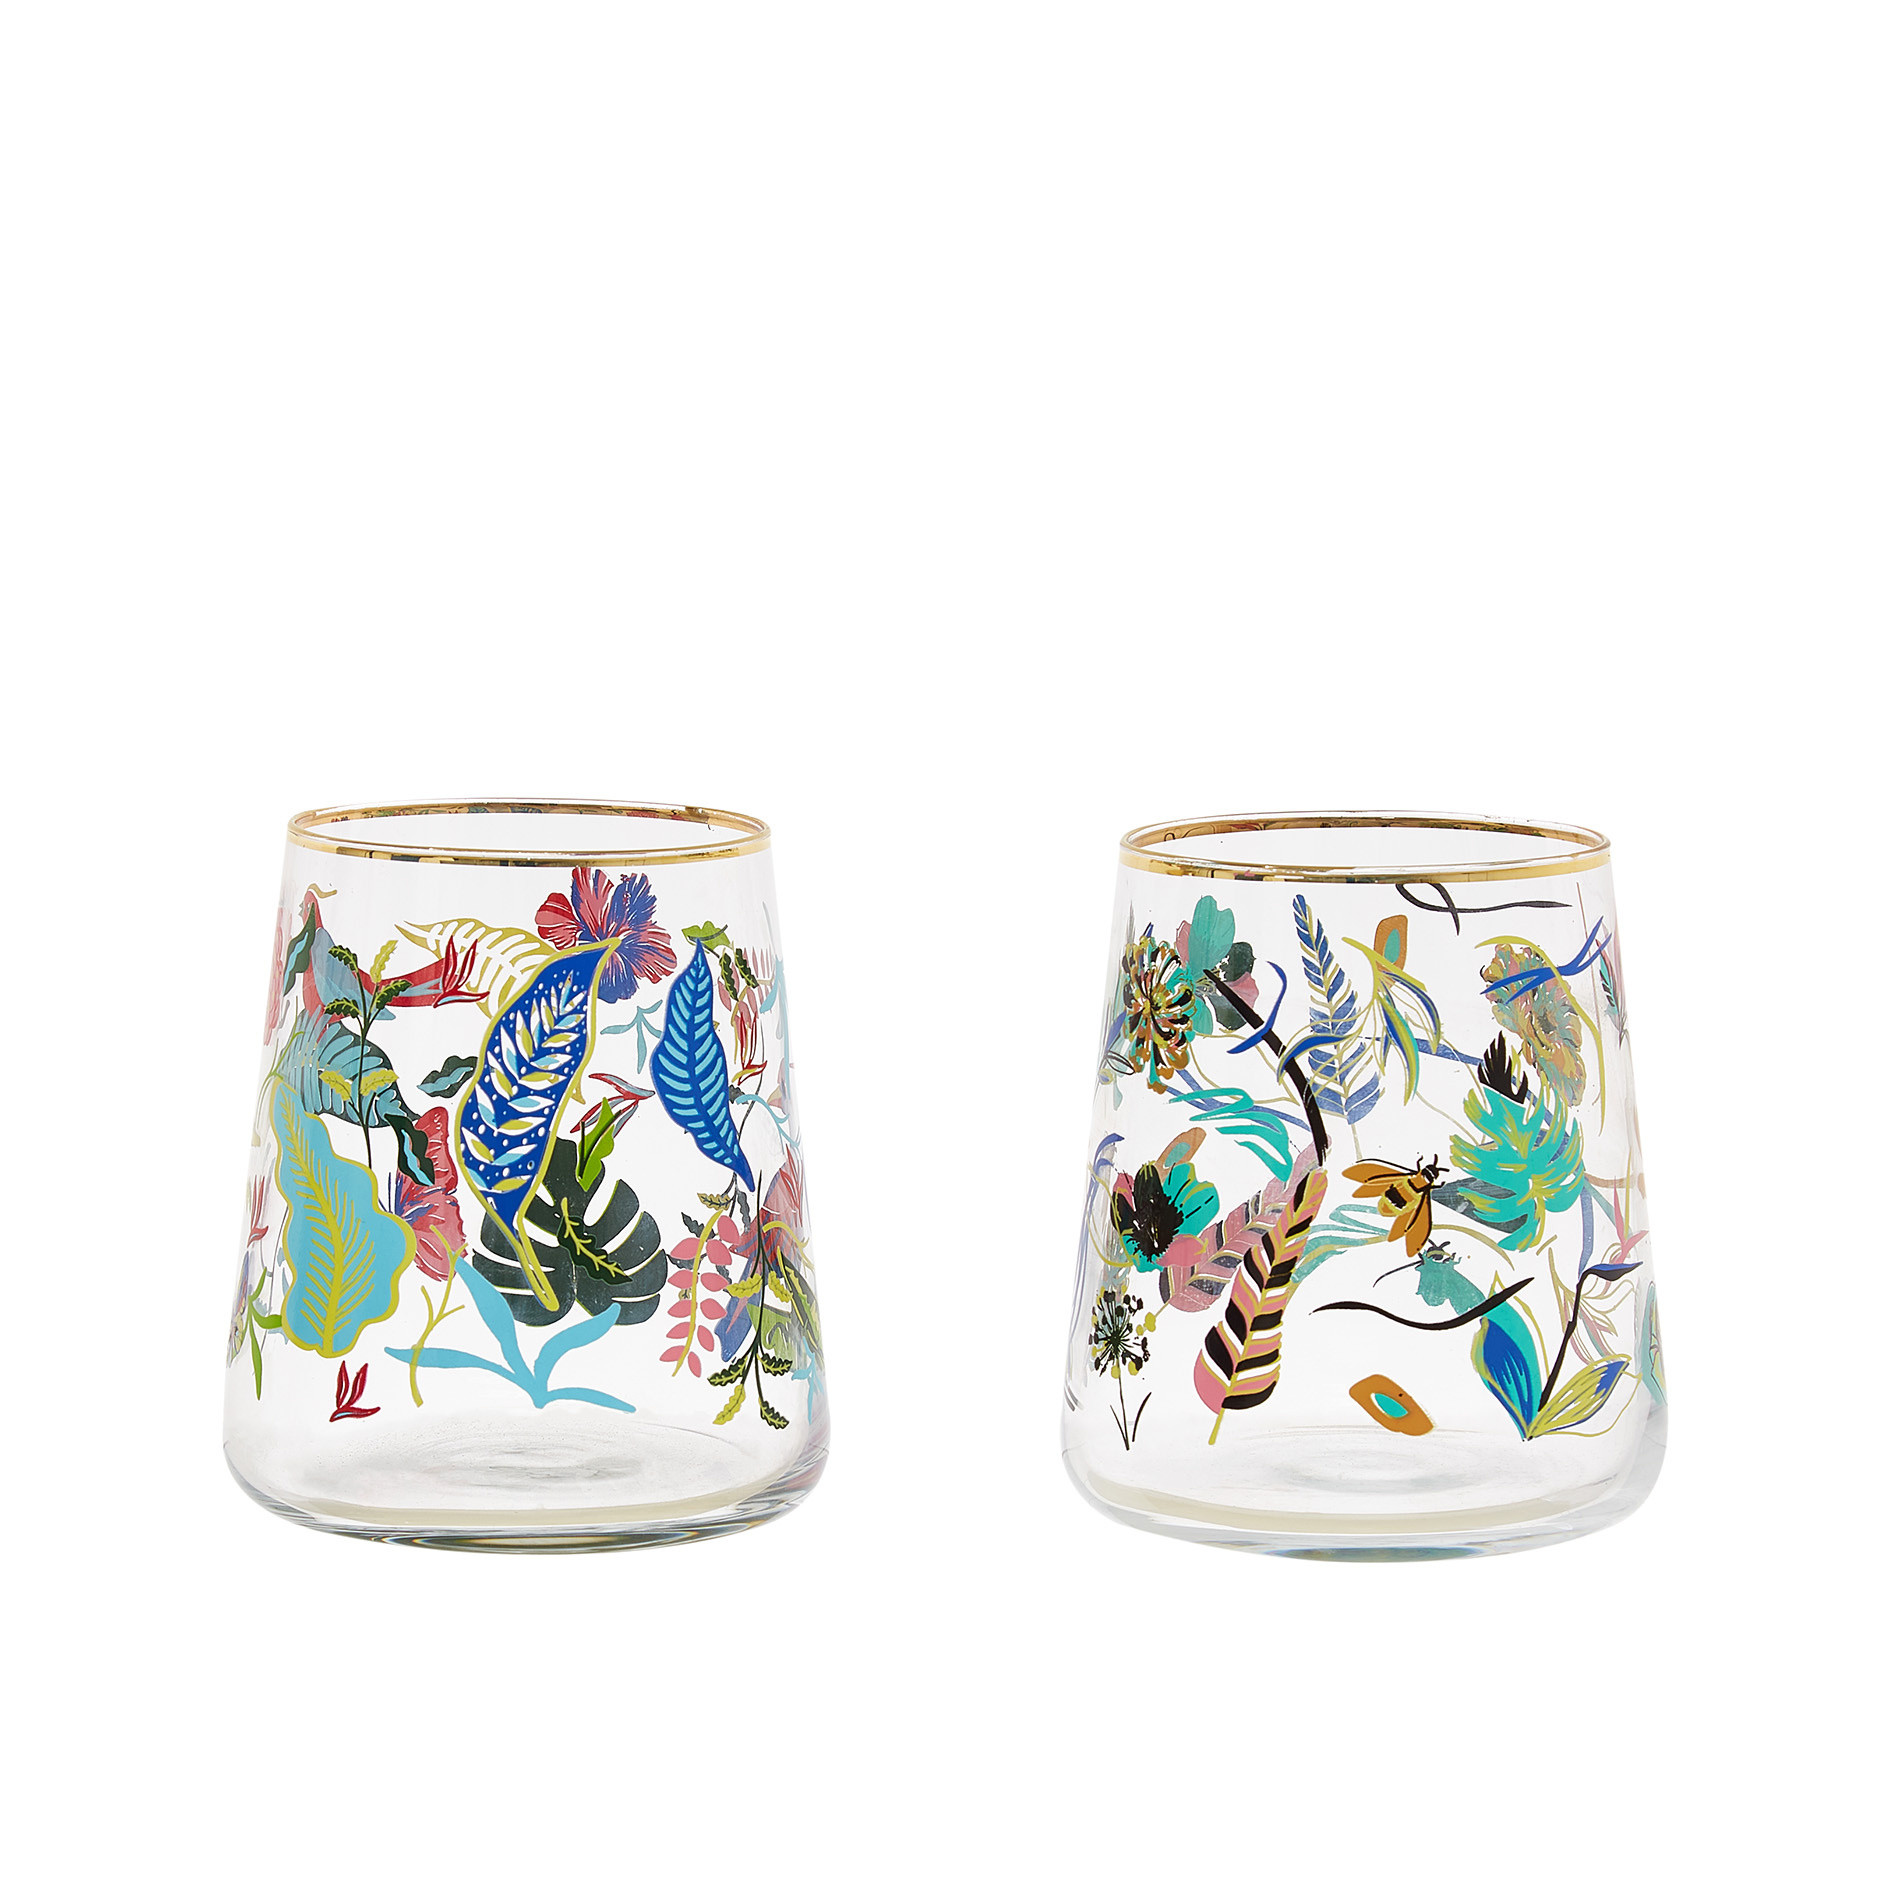 Bicchiere vetro motivo amazzonia, Trasparente, large image number 0